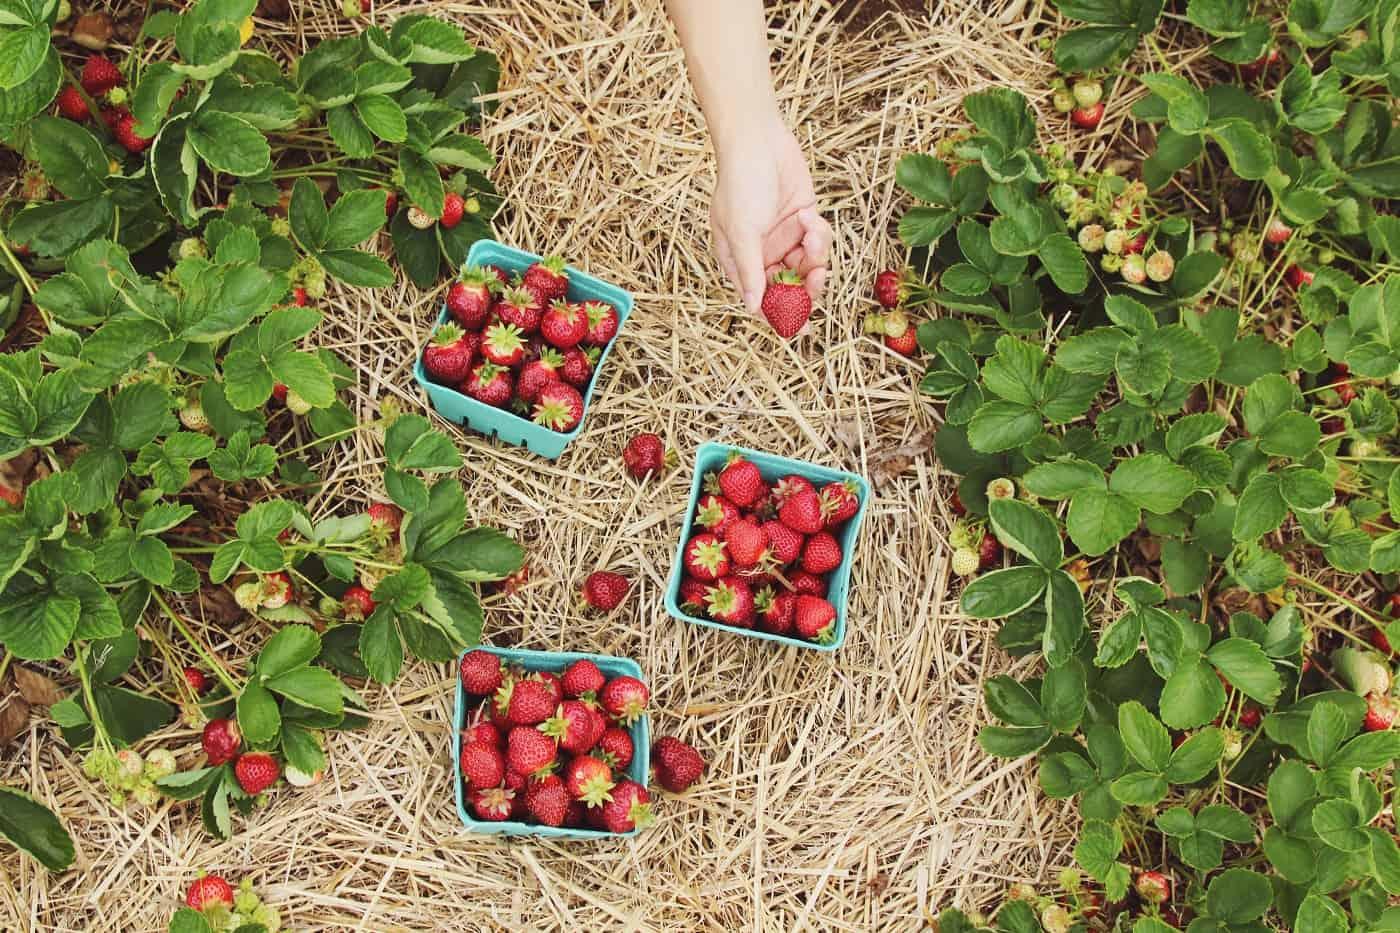 Picked strawberries in garden - Reduce that carbon footprint